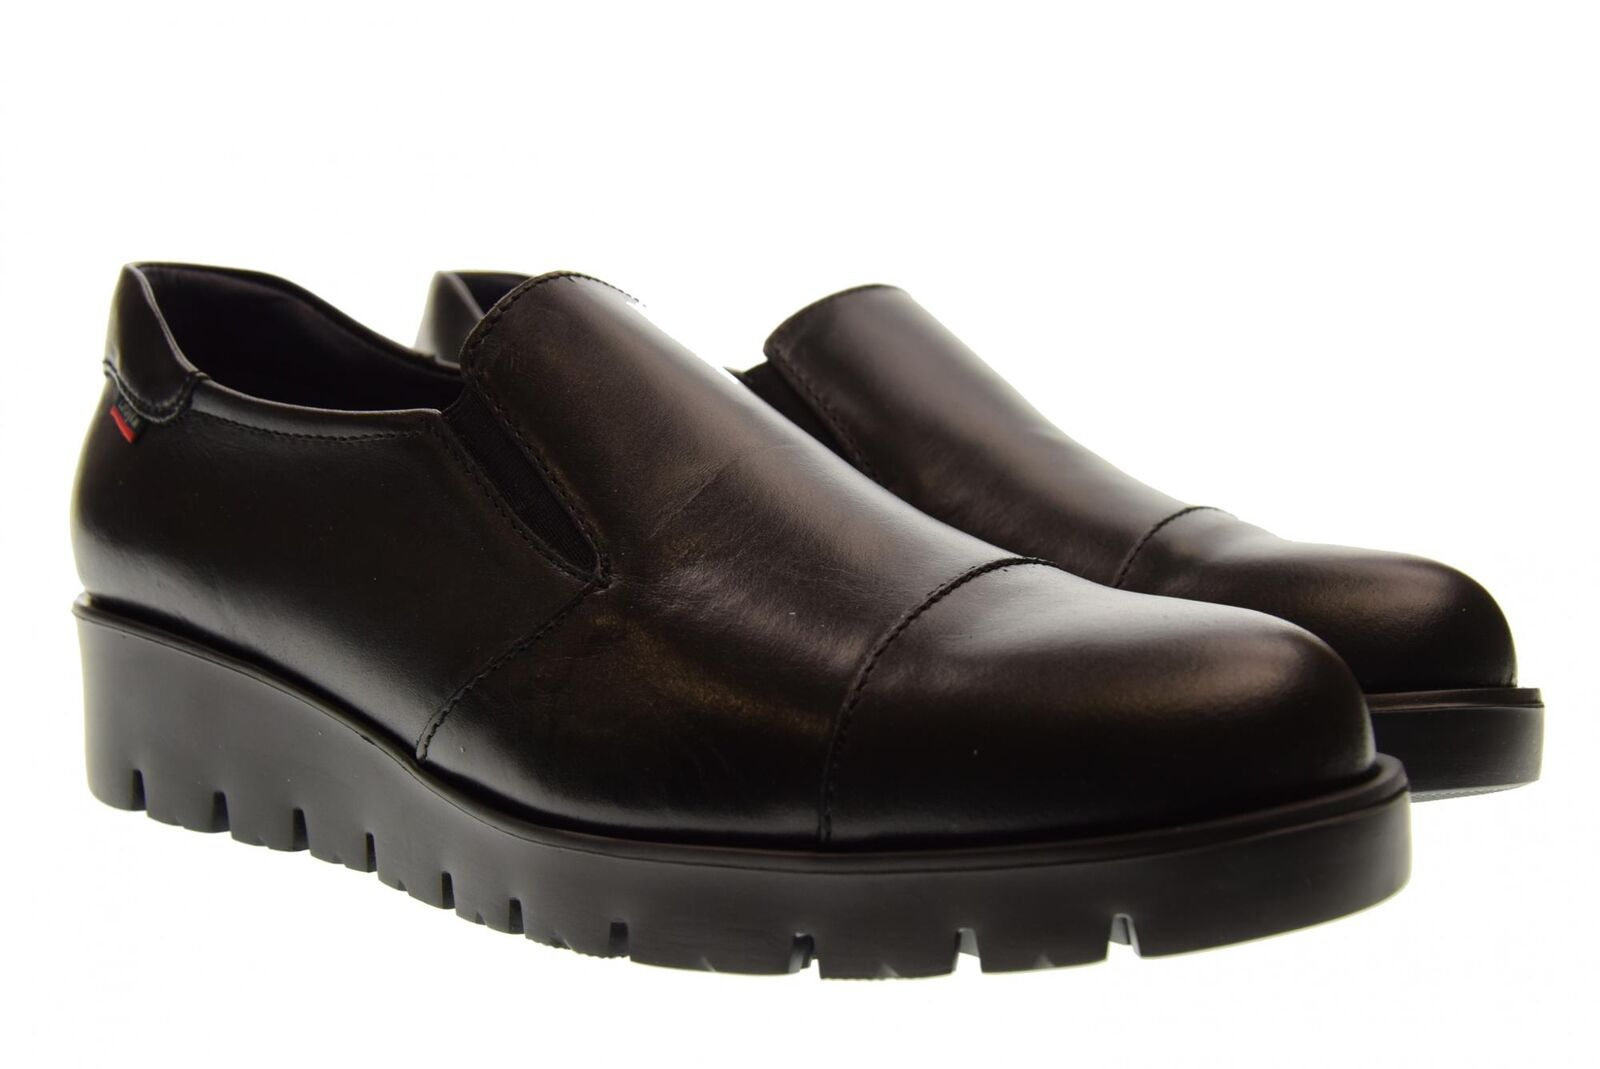 Callaghan A18s zapato femmes slip on con cuña 89817 HAhomme noir